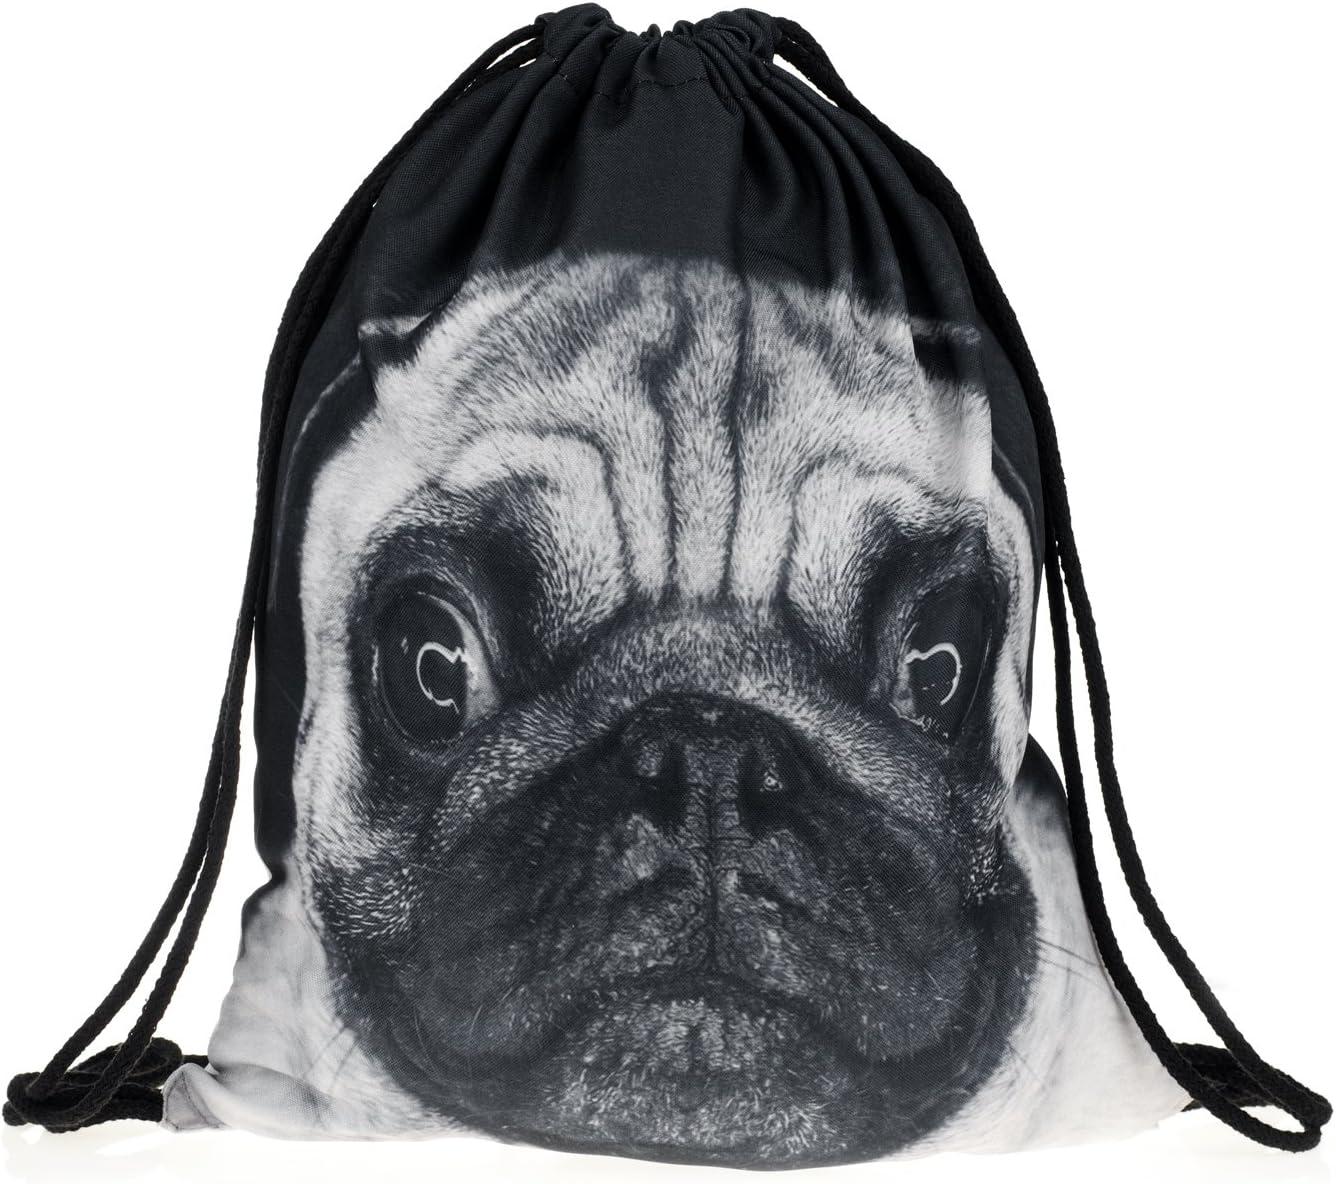 Fringoo Genuine Free Shipping Men's Fullprint Max 58% OFF Drawstring Bag Shoulder Rucksac Backpack